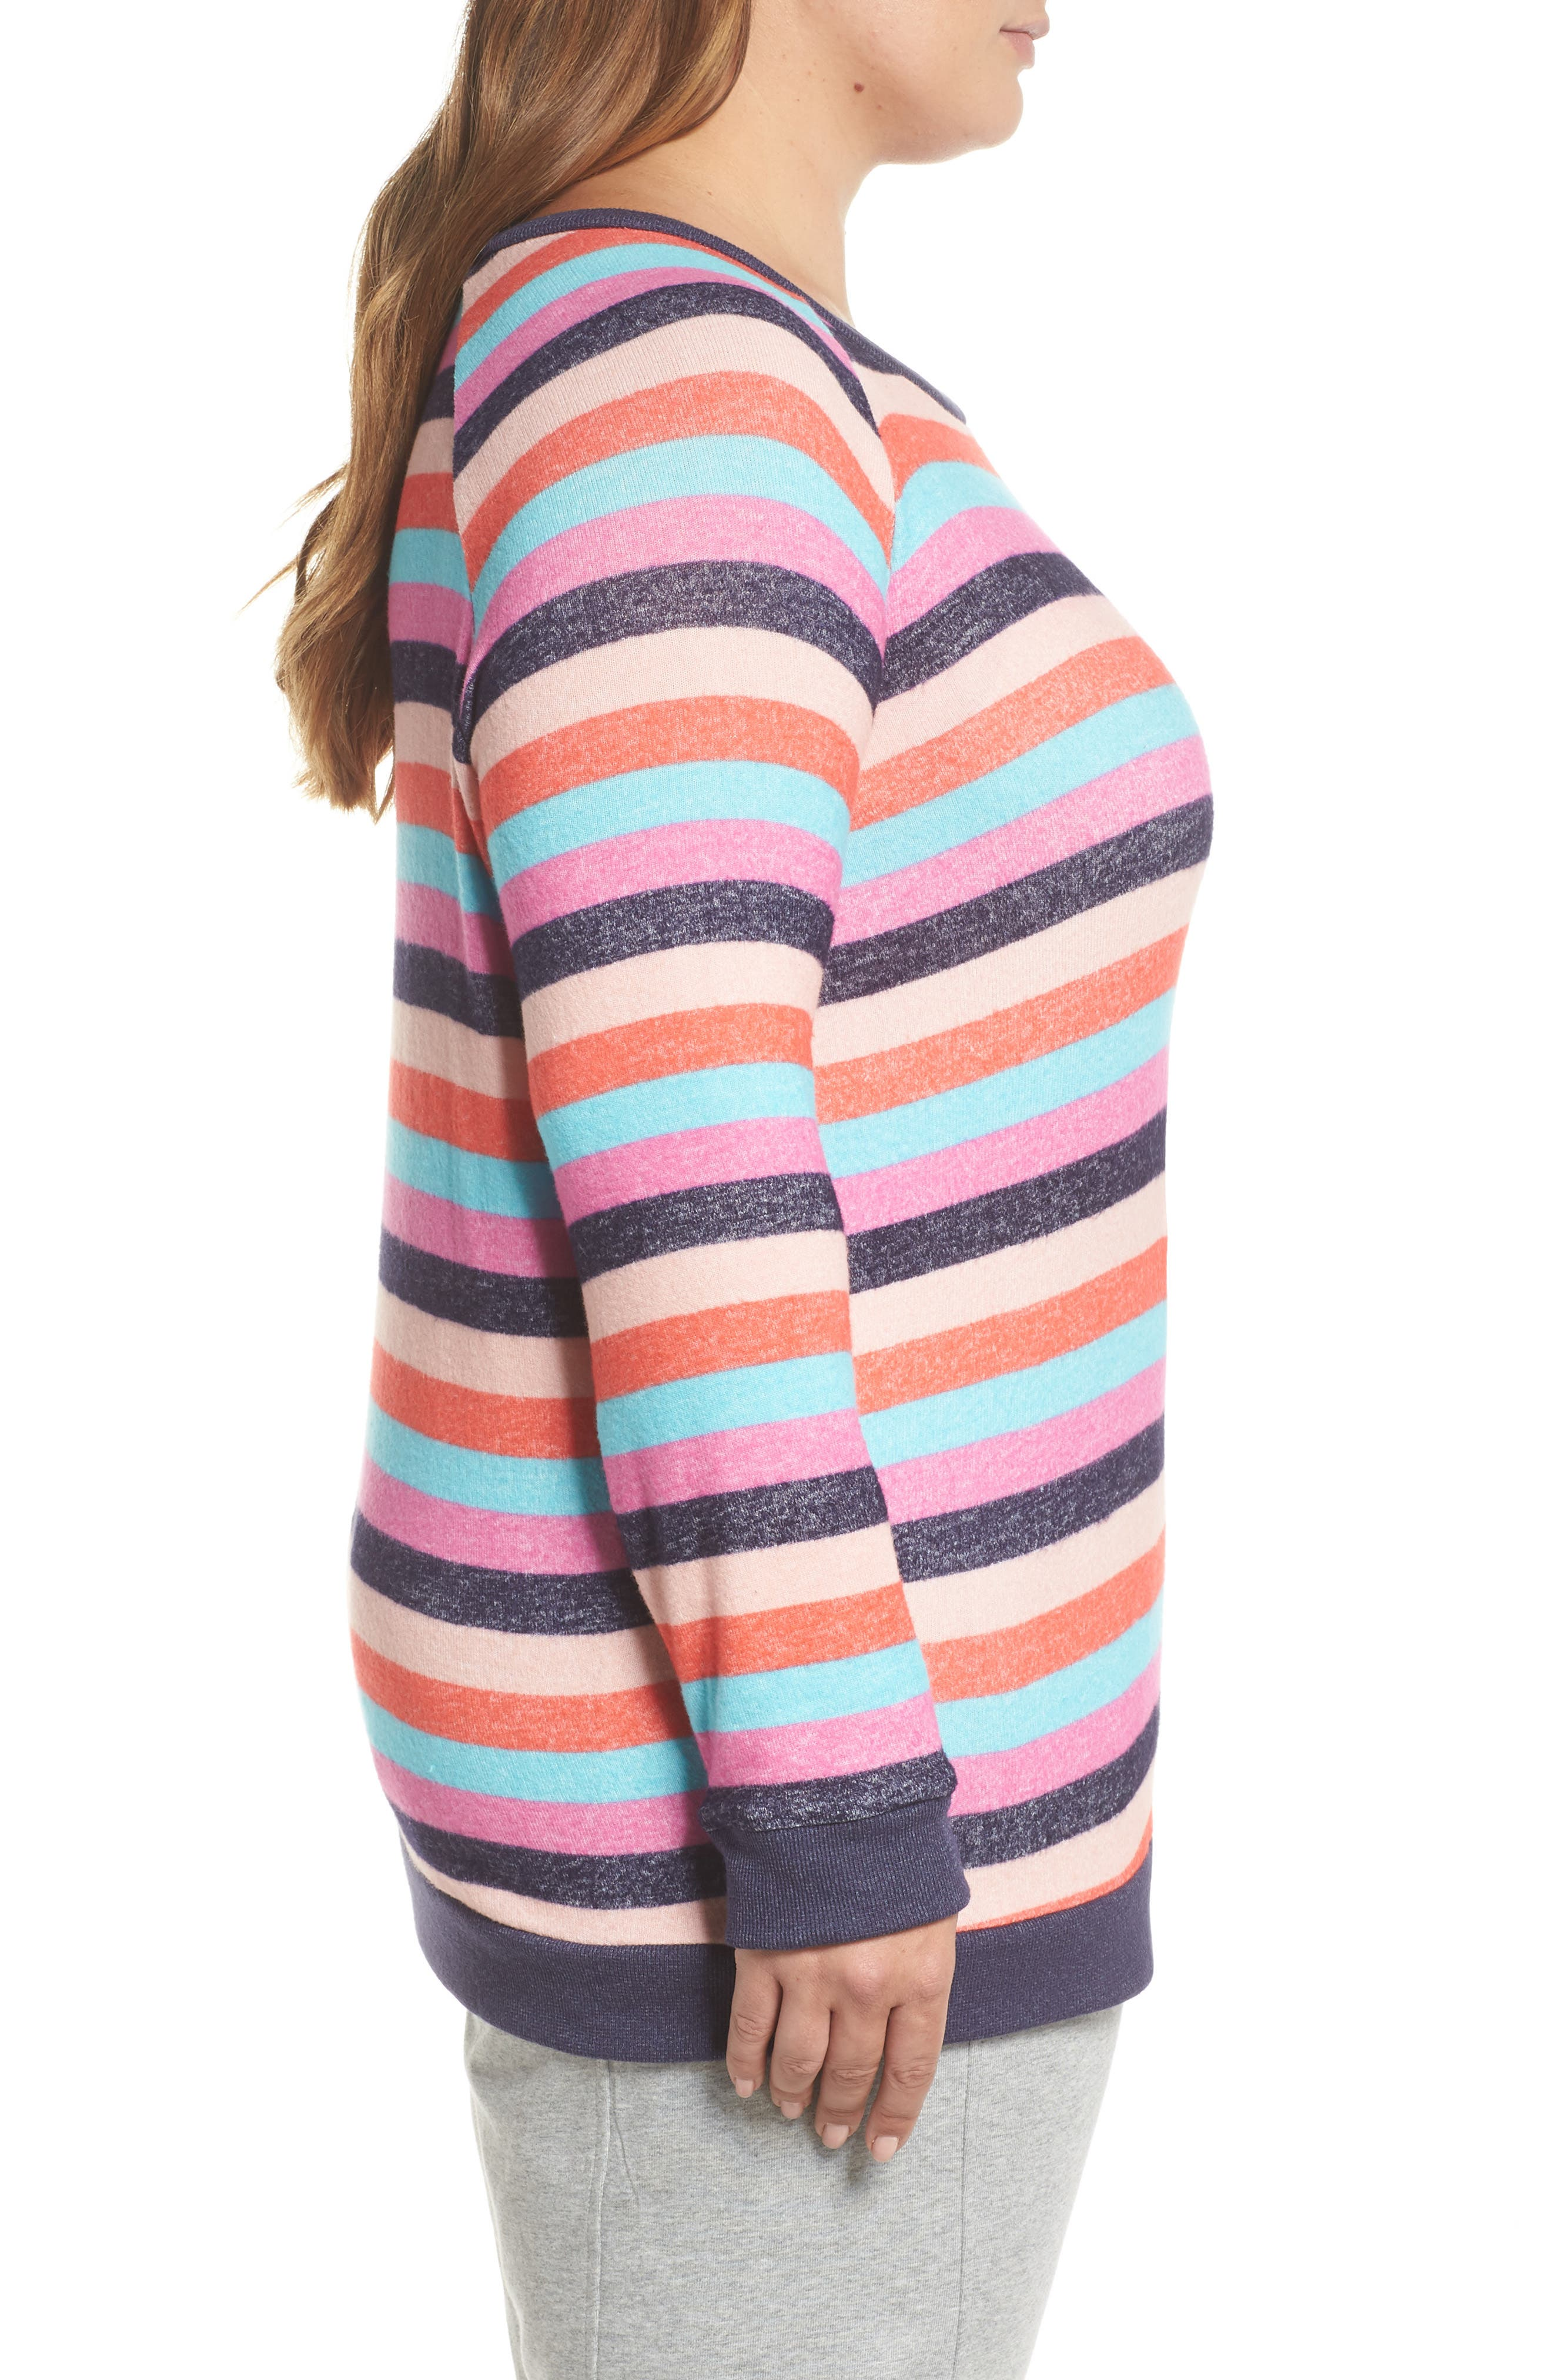 Cozy Crew Lounge Sweater,                             Alternate thumbnail 3, color,                             Navy Dusk Milli Multi Stripe